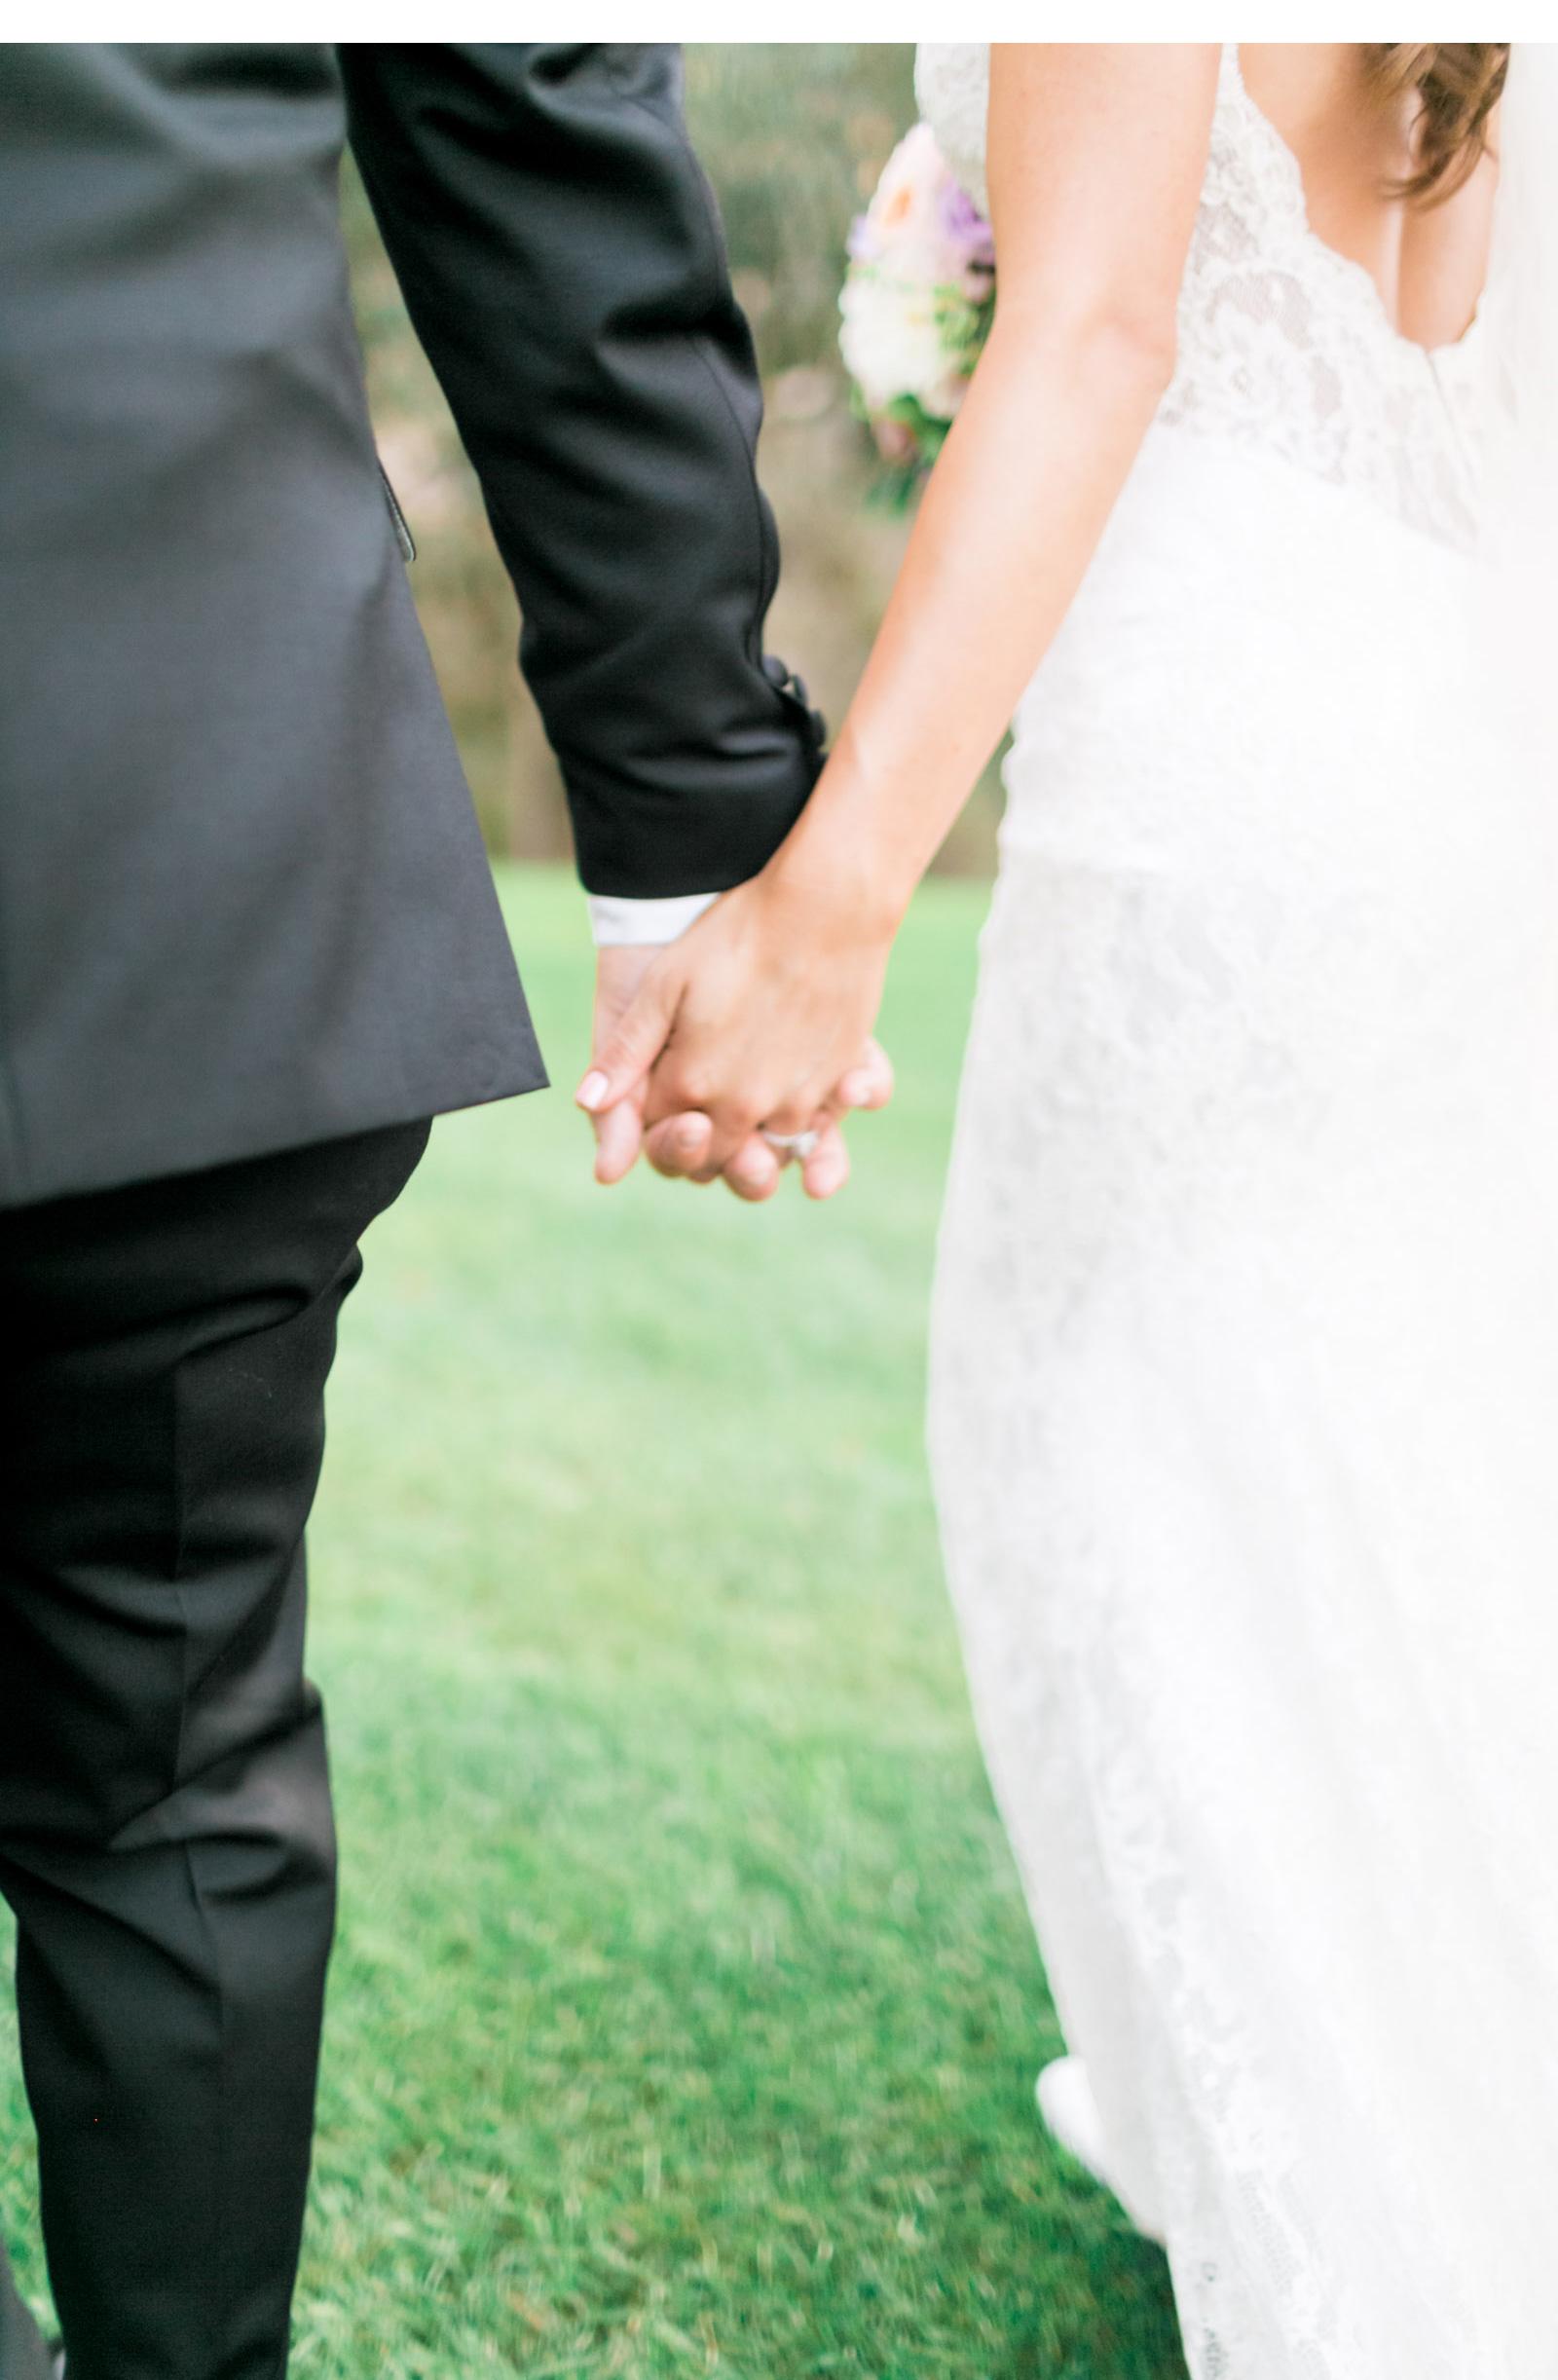 Daniel-&-Nia-Booko-Wedding-Natalie-Schutt-Photography_04.jpg